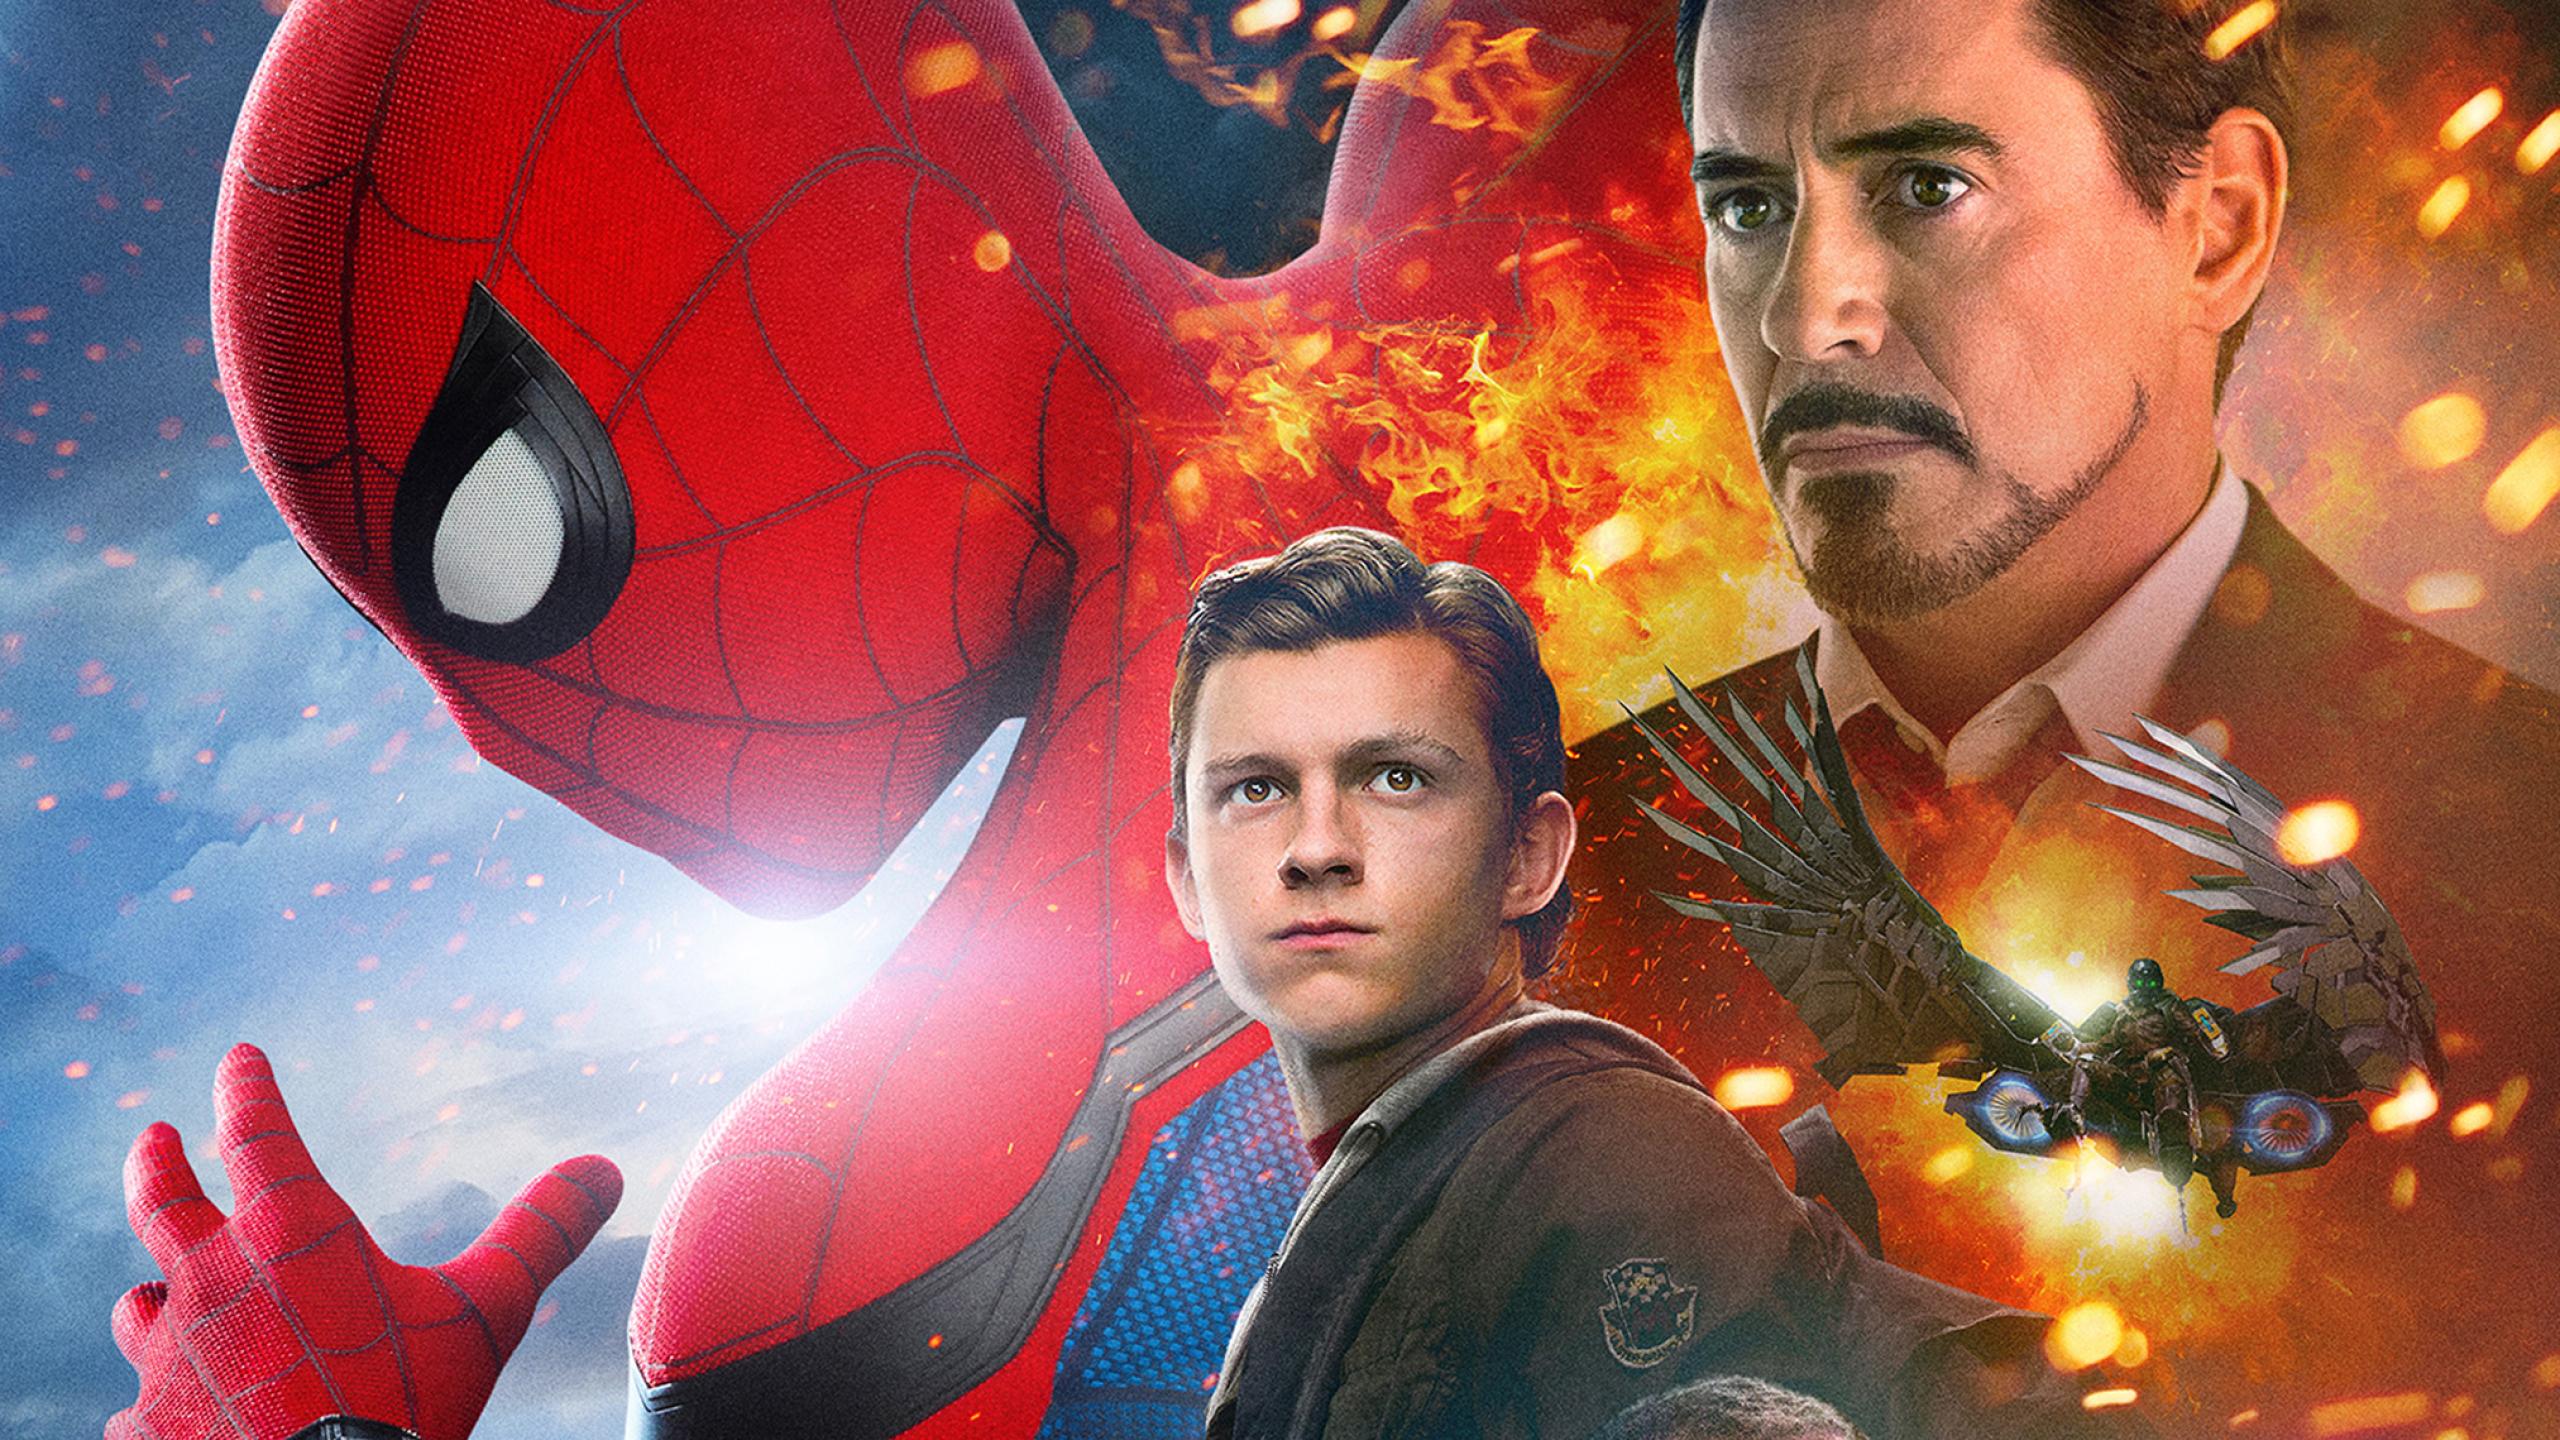 Spiderman homecoming iron man full hd 2k wallpaper - Iron man spiderman wallpaper ...